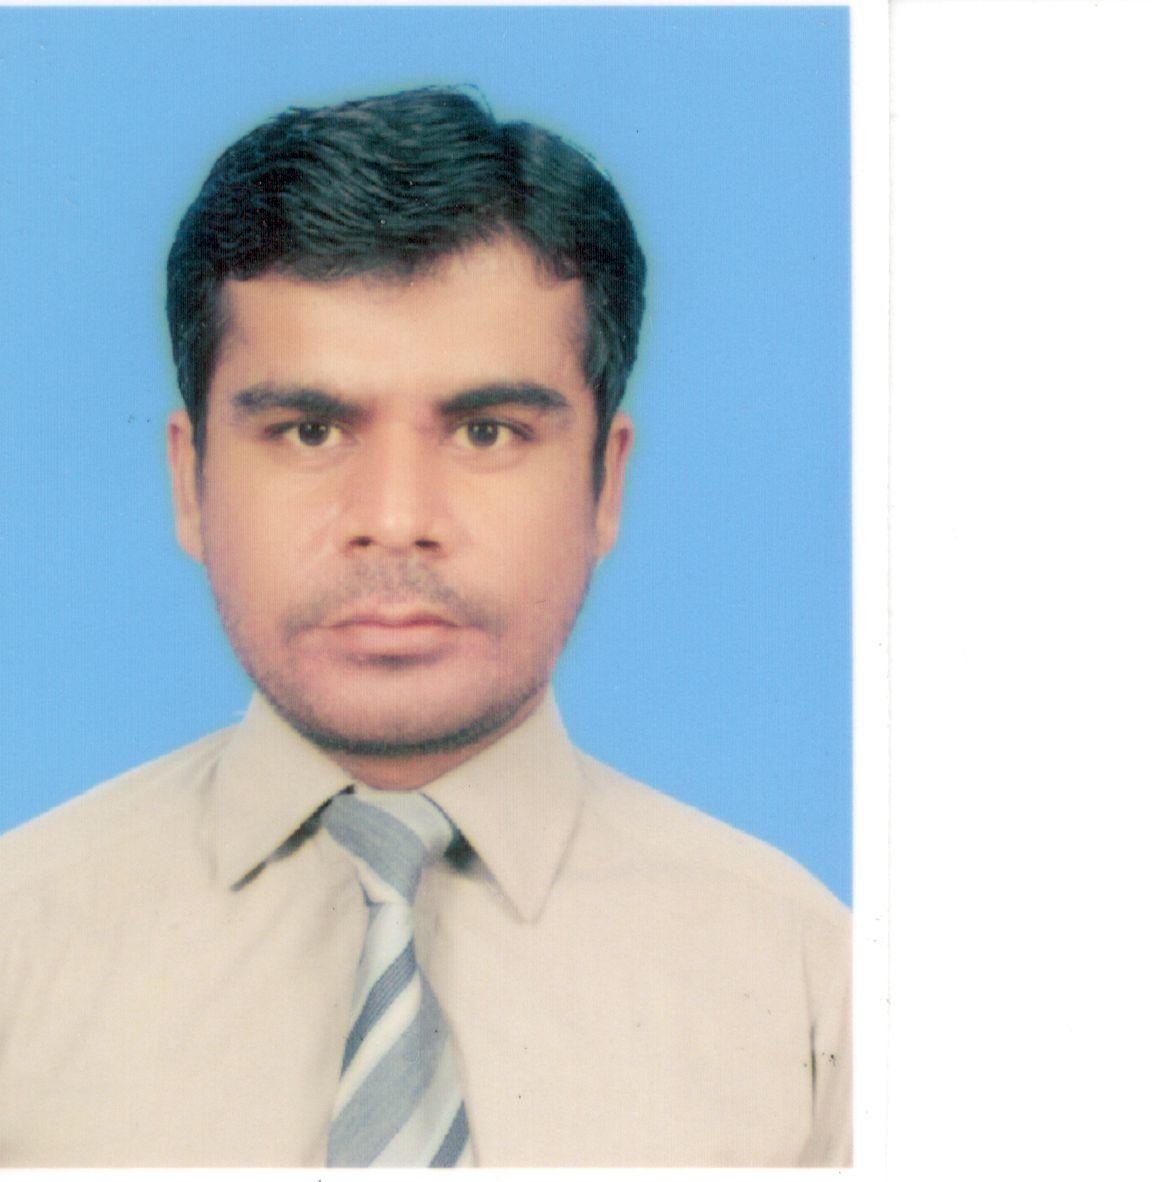 Faheem Ali Khokhar Management, Business Analysis, Financial Markets, Market Research, Financial Research